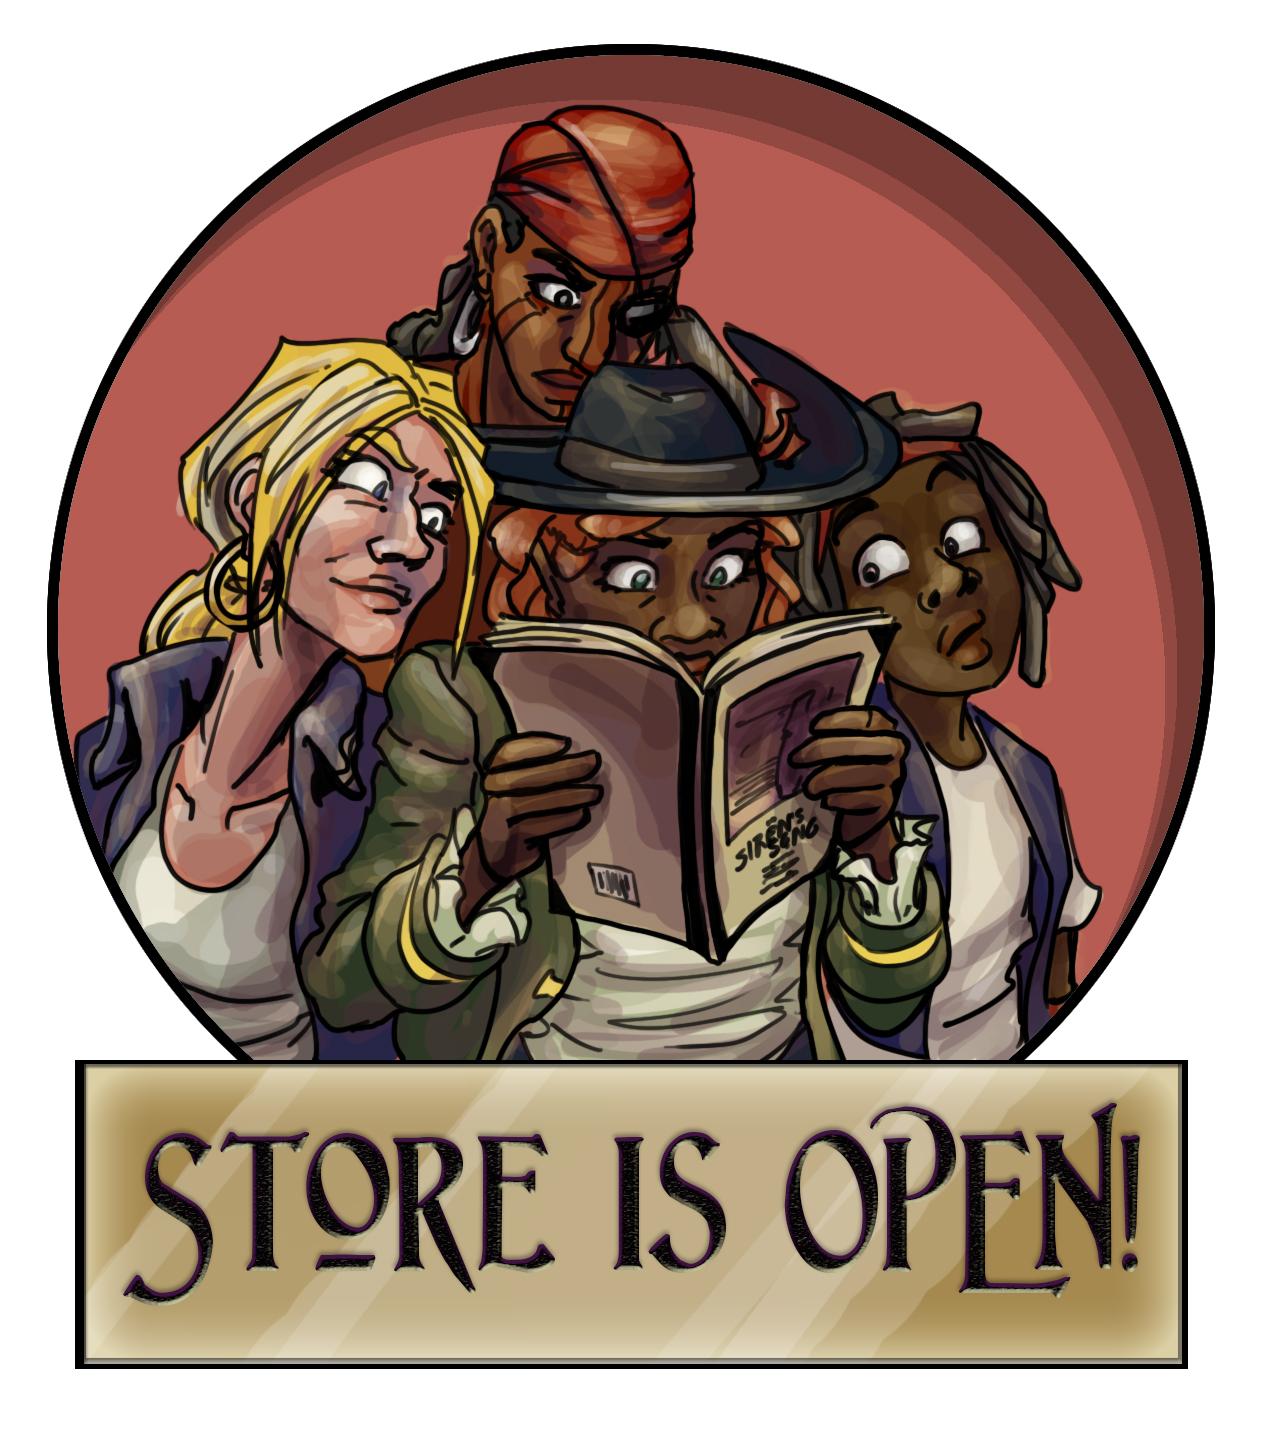 Store open.jpg